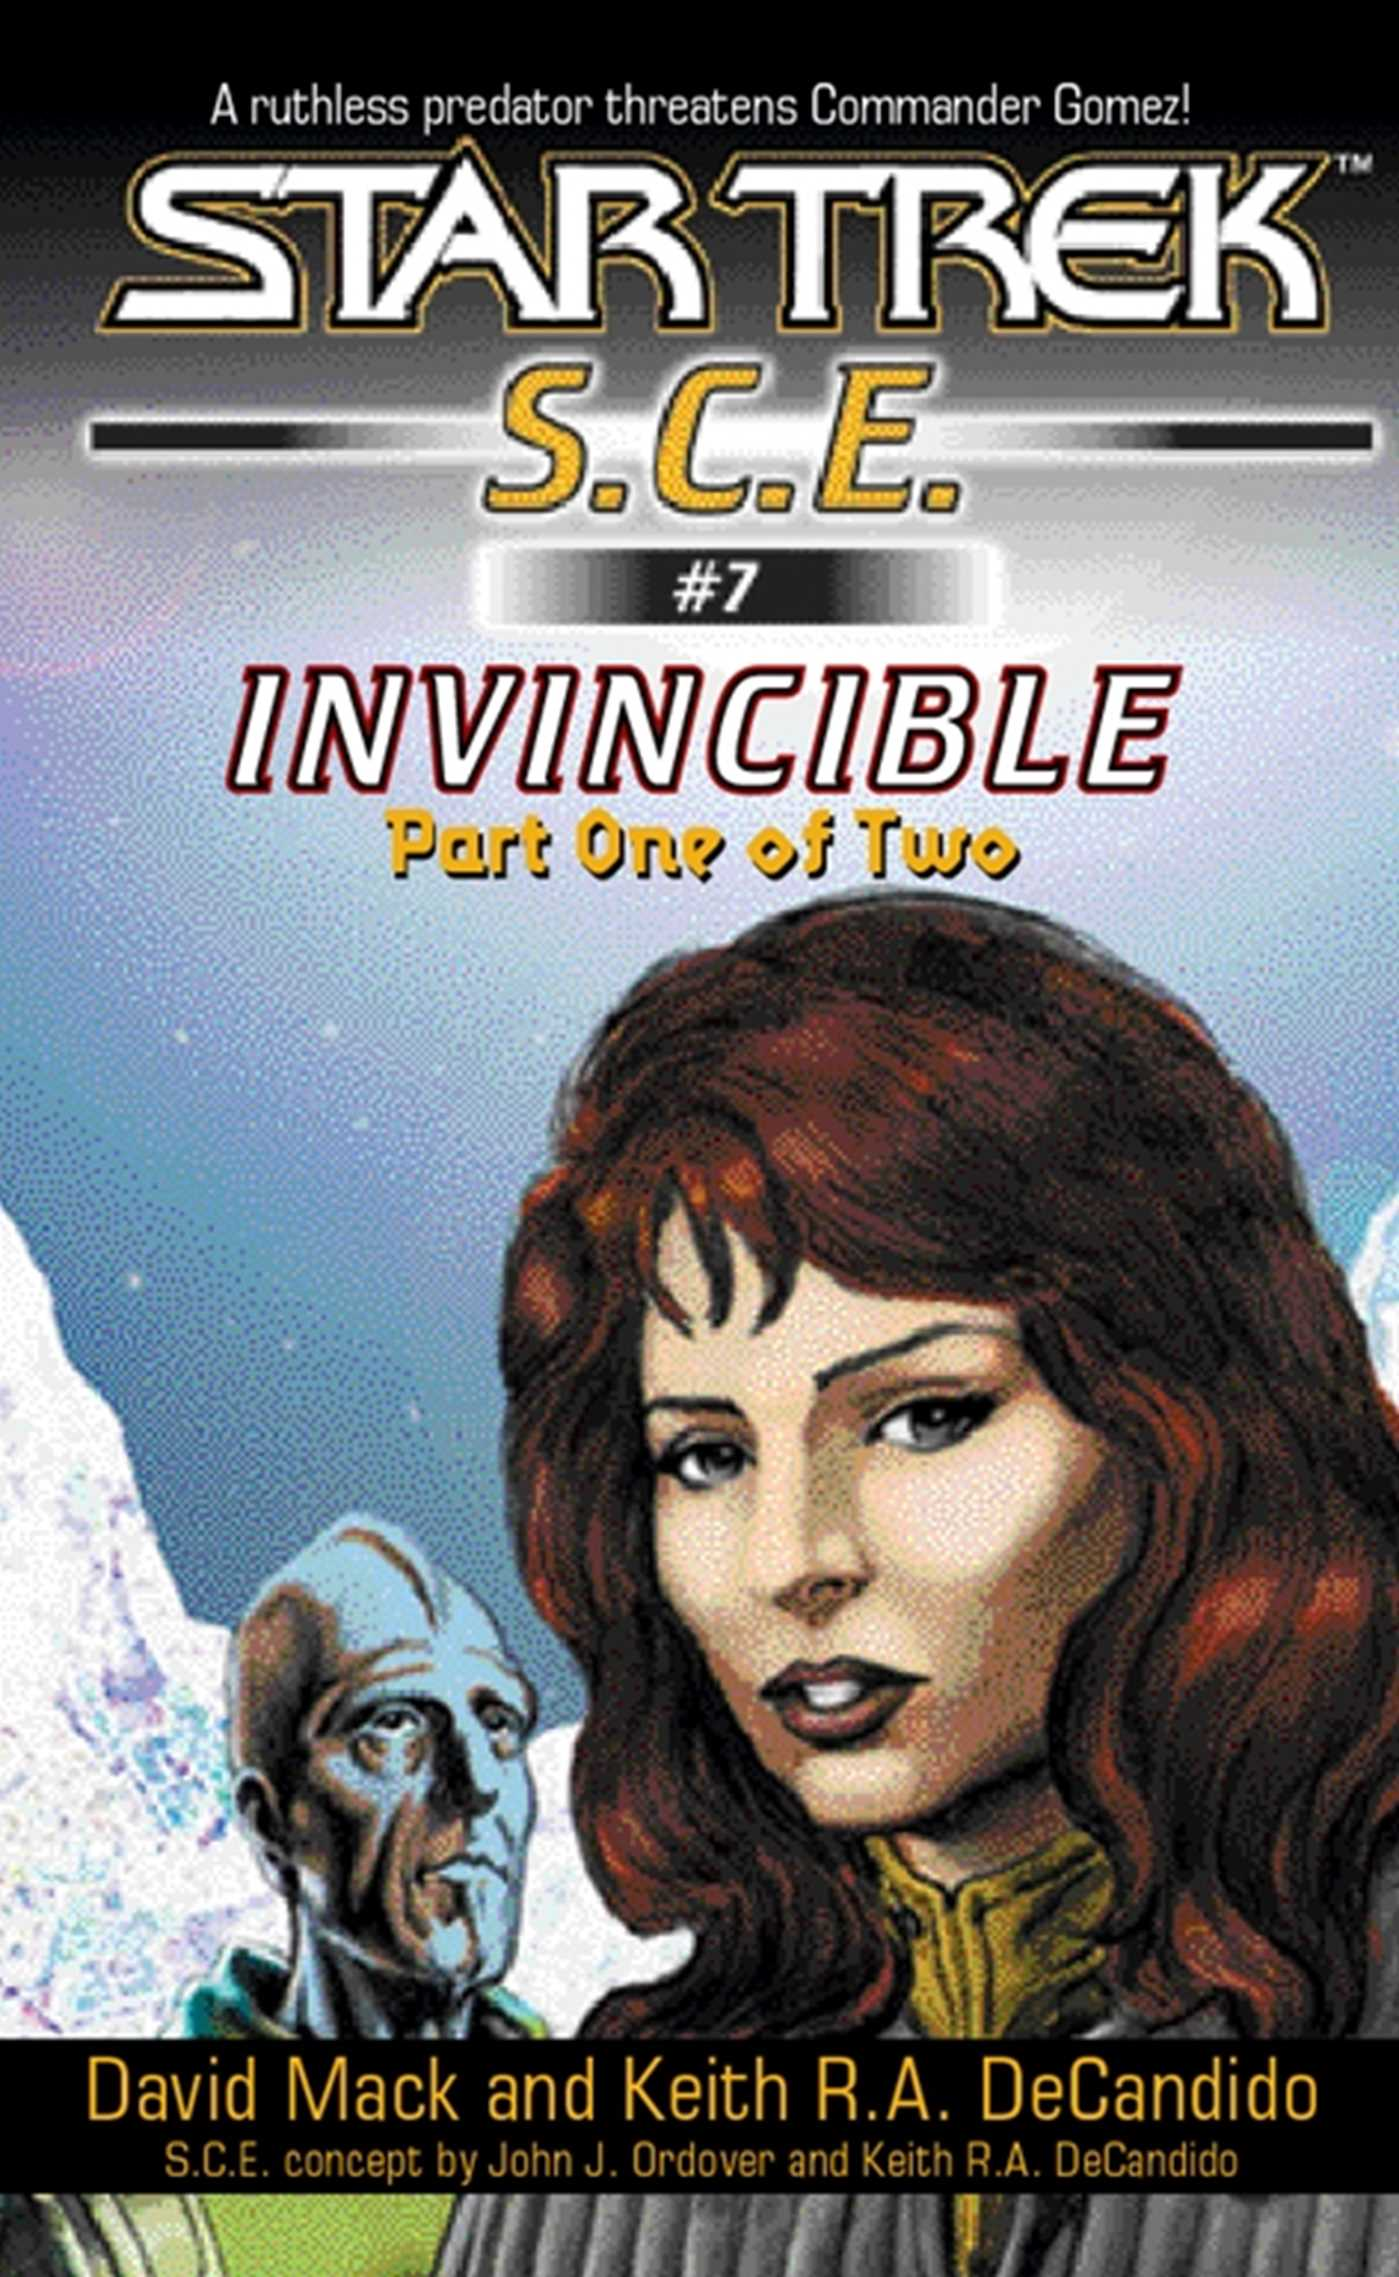 Star trek invincible book one 9780743428729 hr